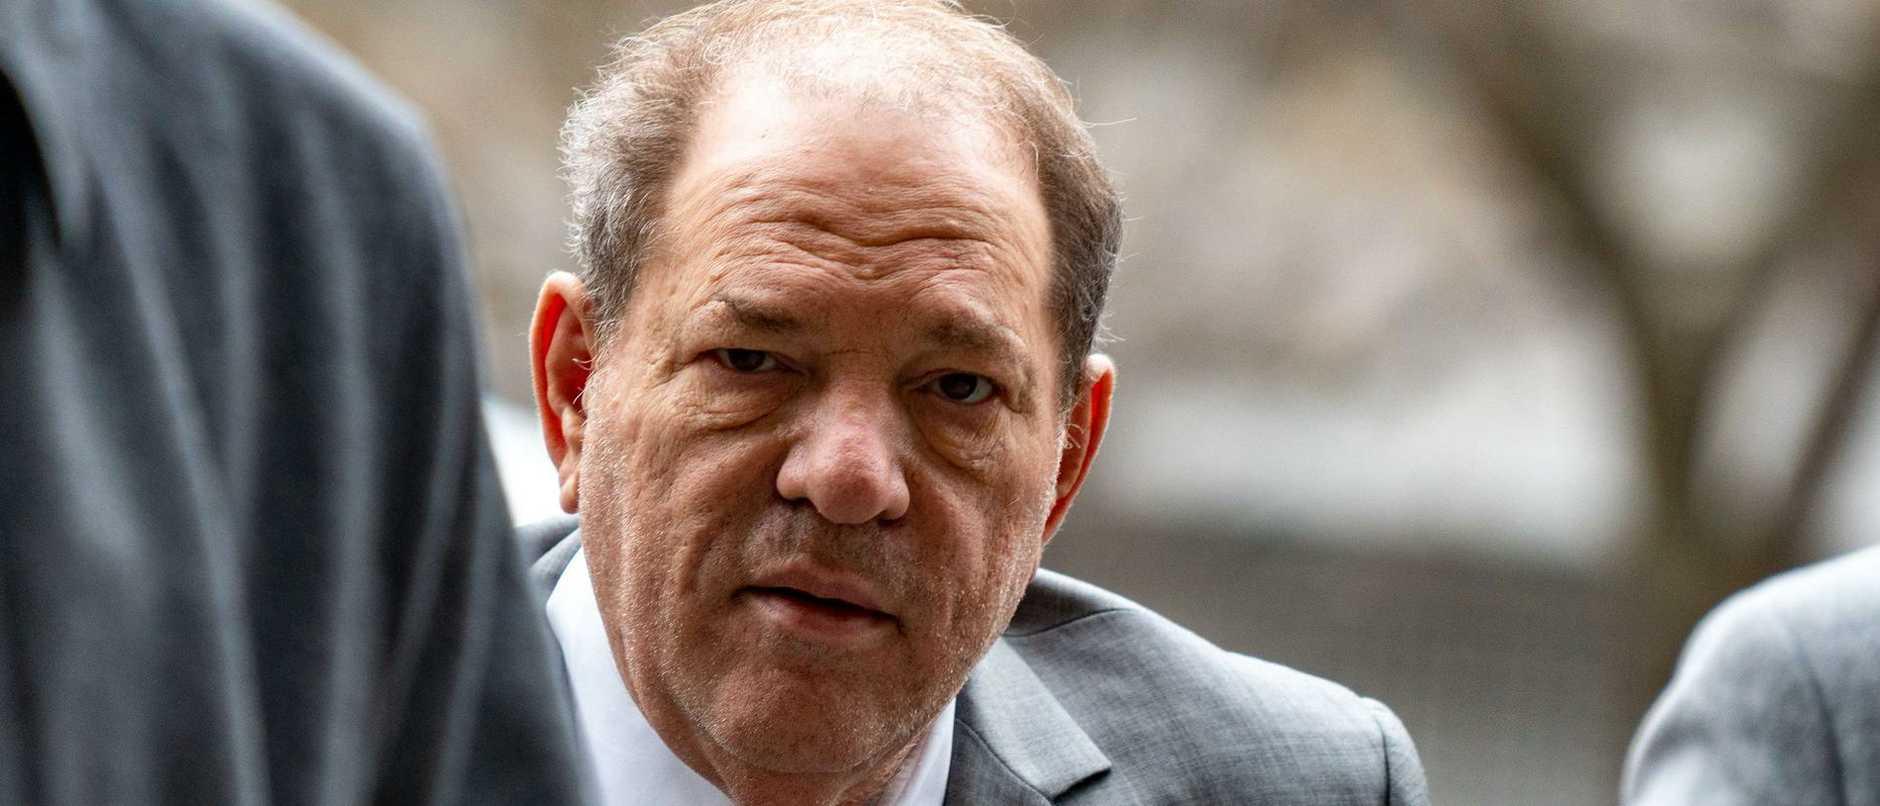 Jury Deliberations Begin In Harvey Weinstein Rape And Assault Trial